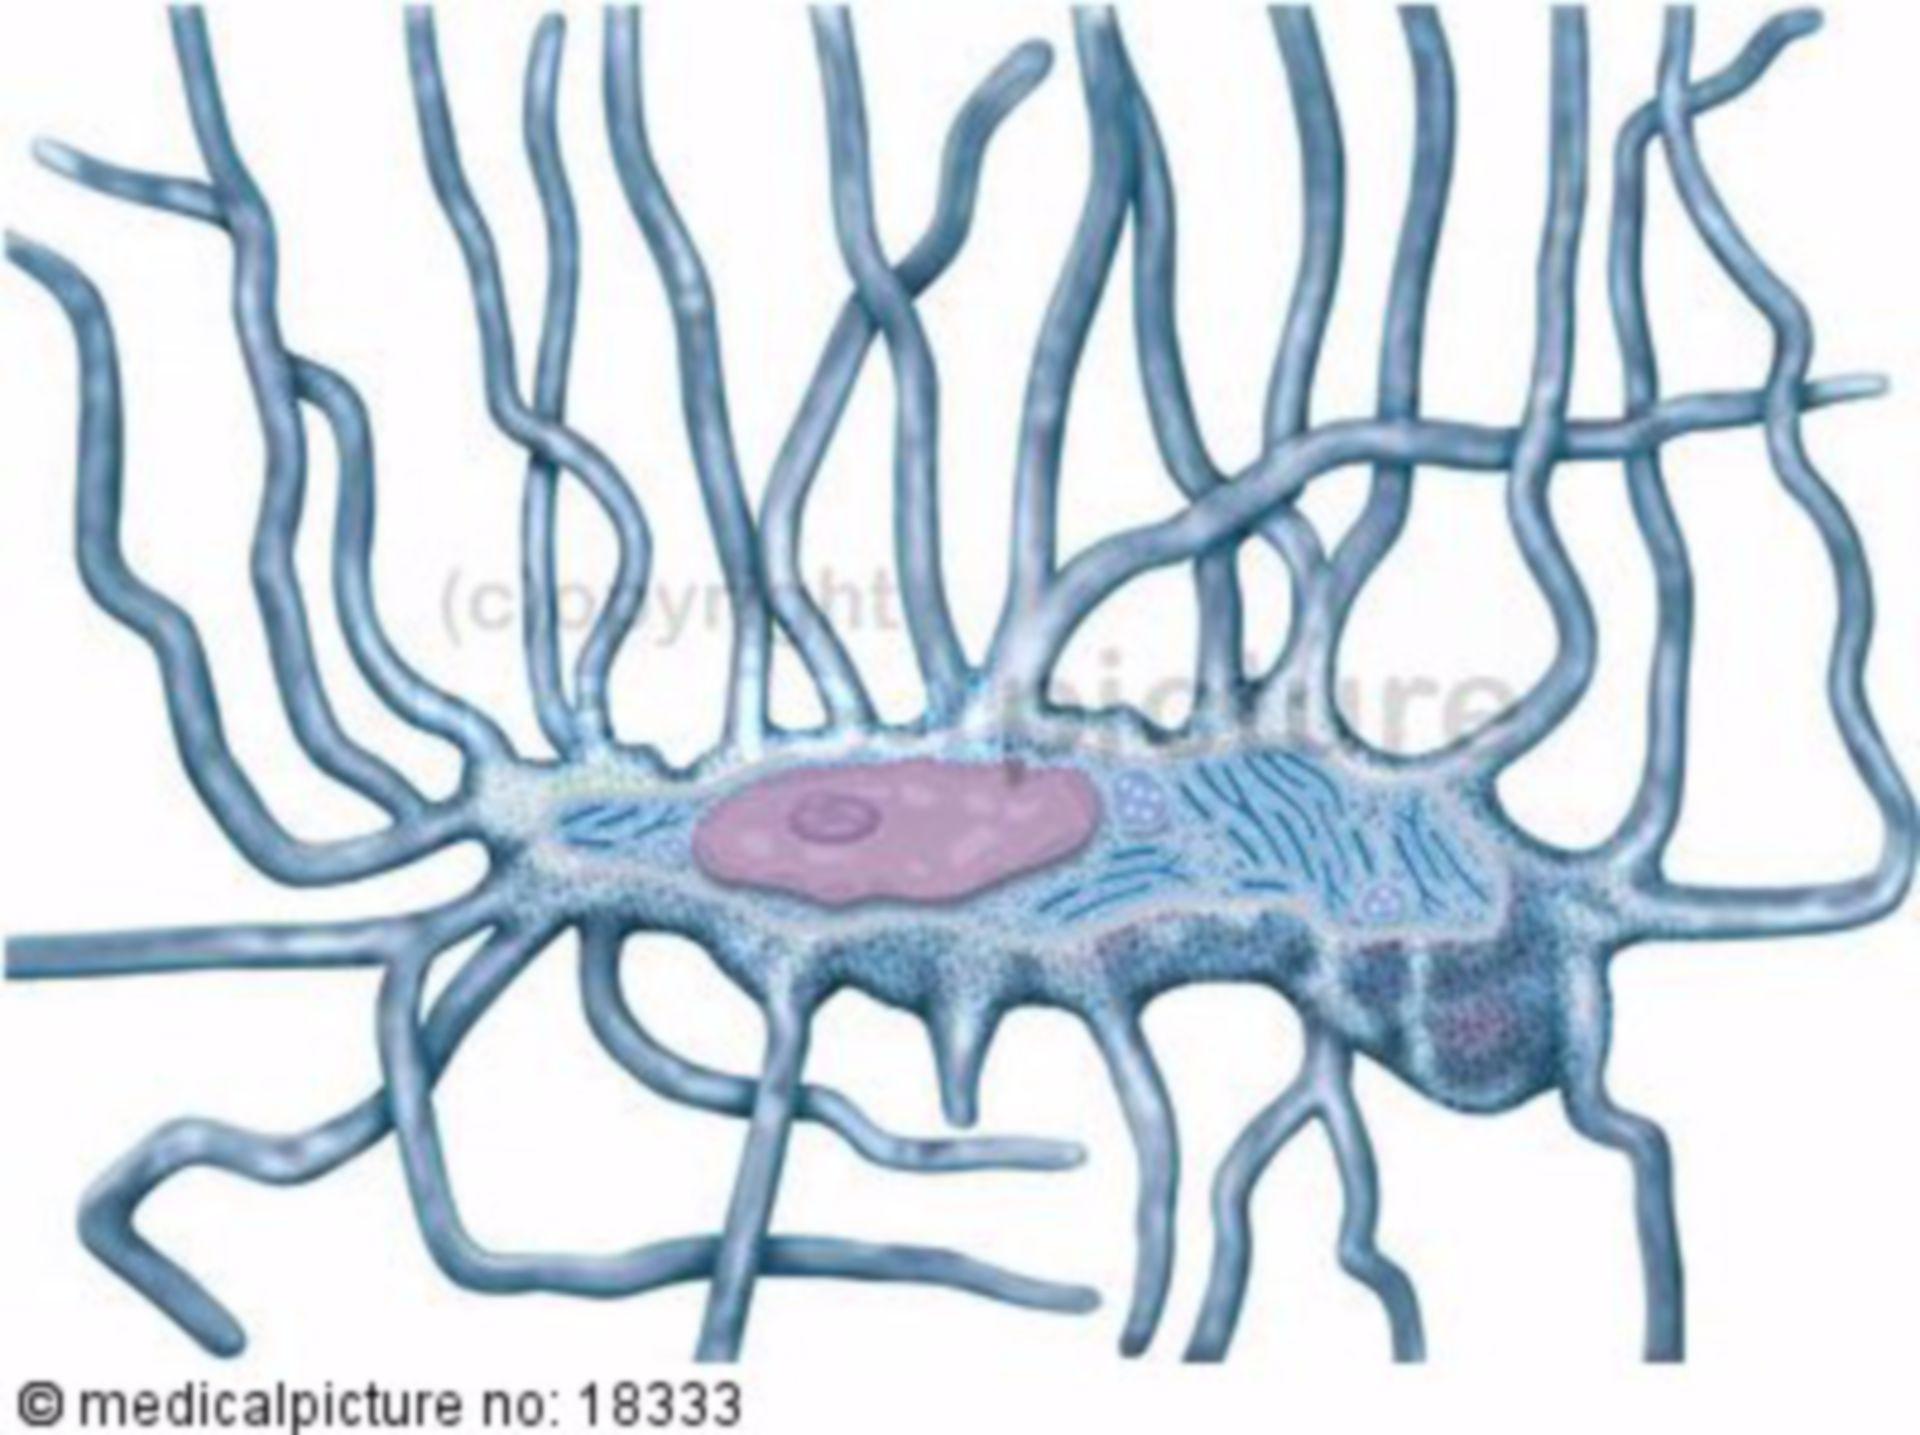 Knochenzelle, Osteozyt